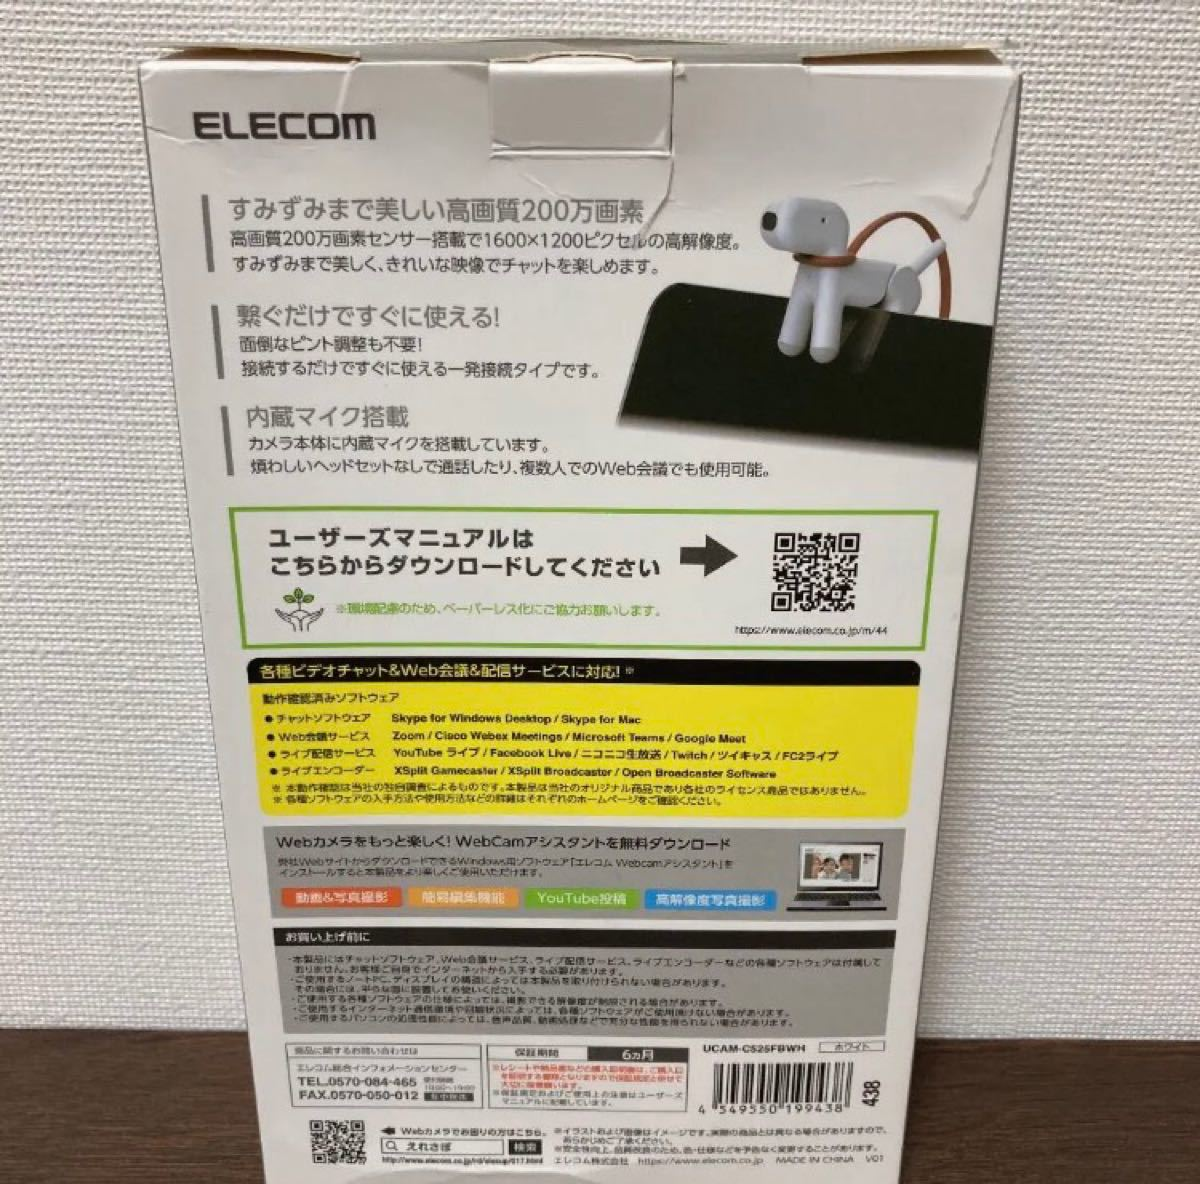 ELECOM エレコム Webカメラ wanco 犬のwebカメラ オンライン学習 ホームカメラ ネットワークカメラ用にも!